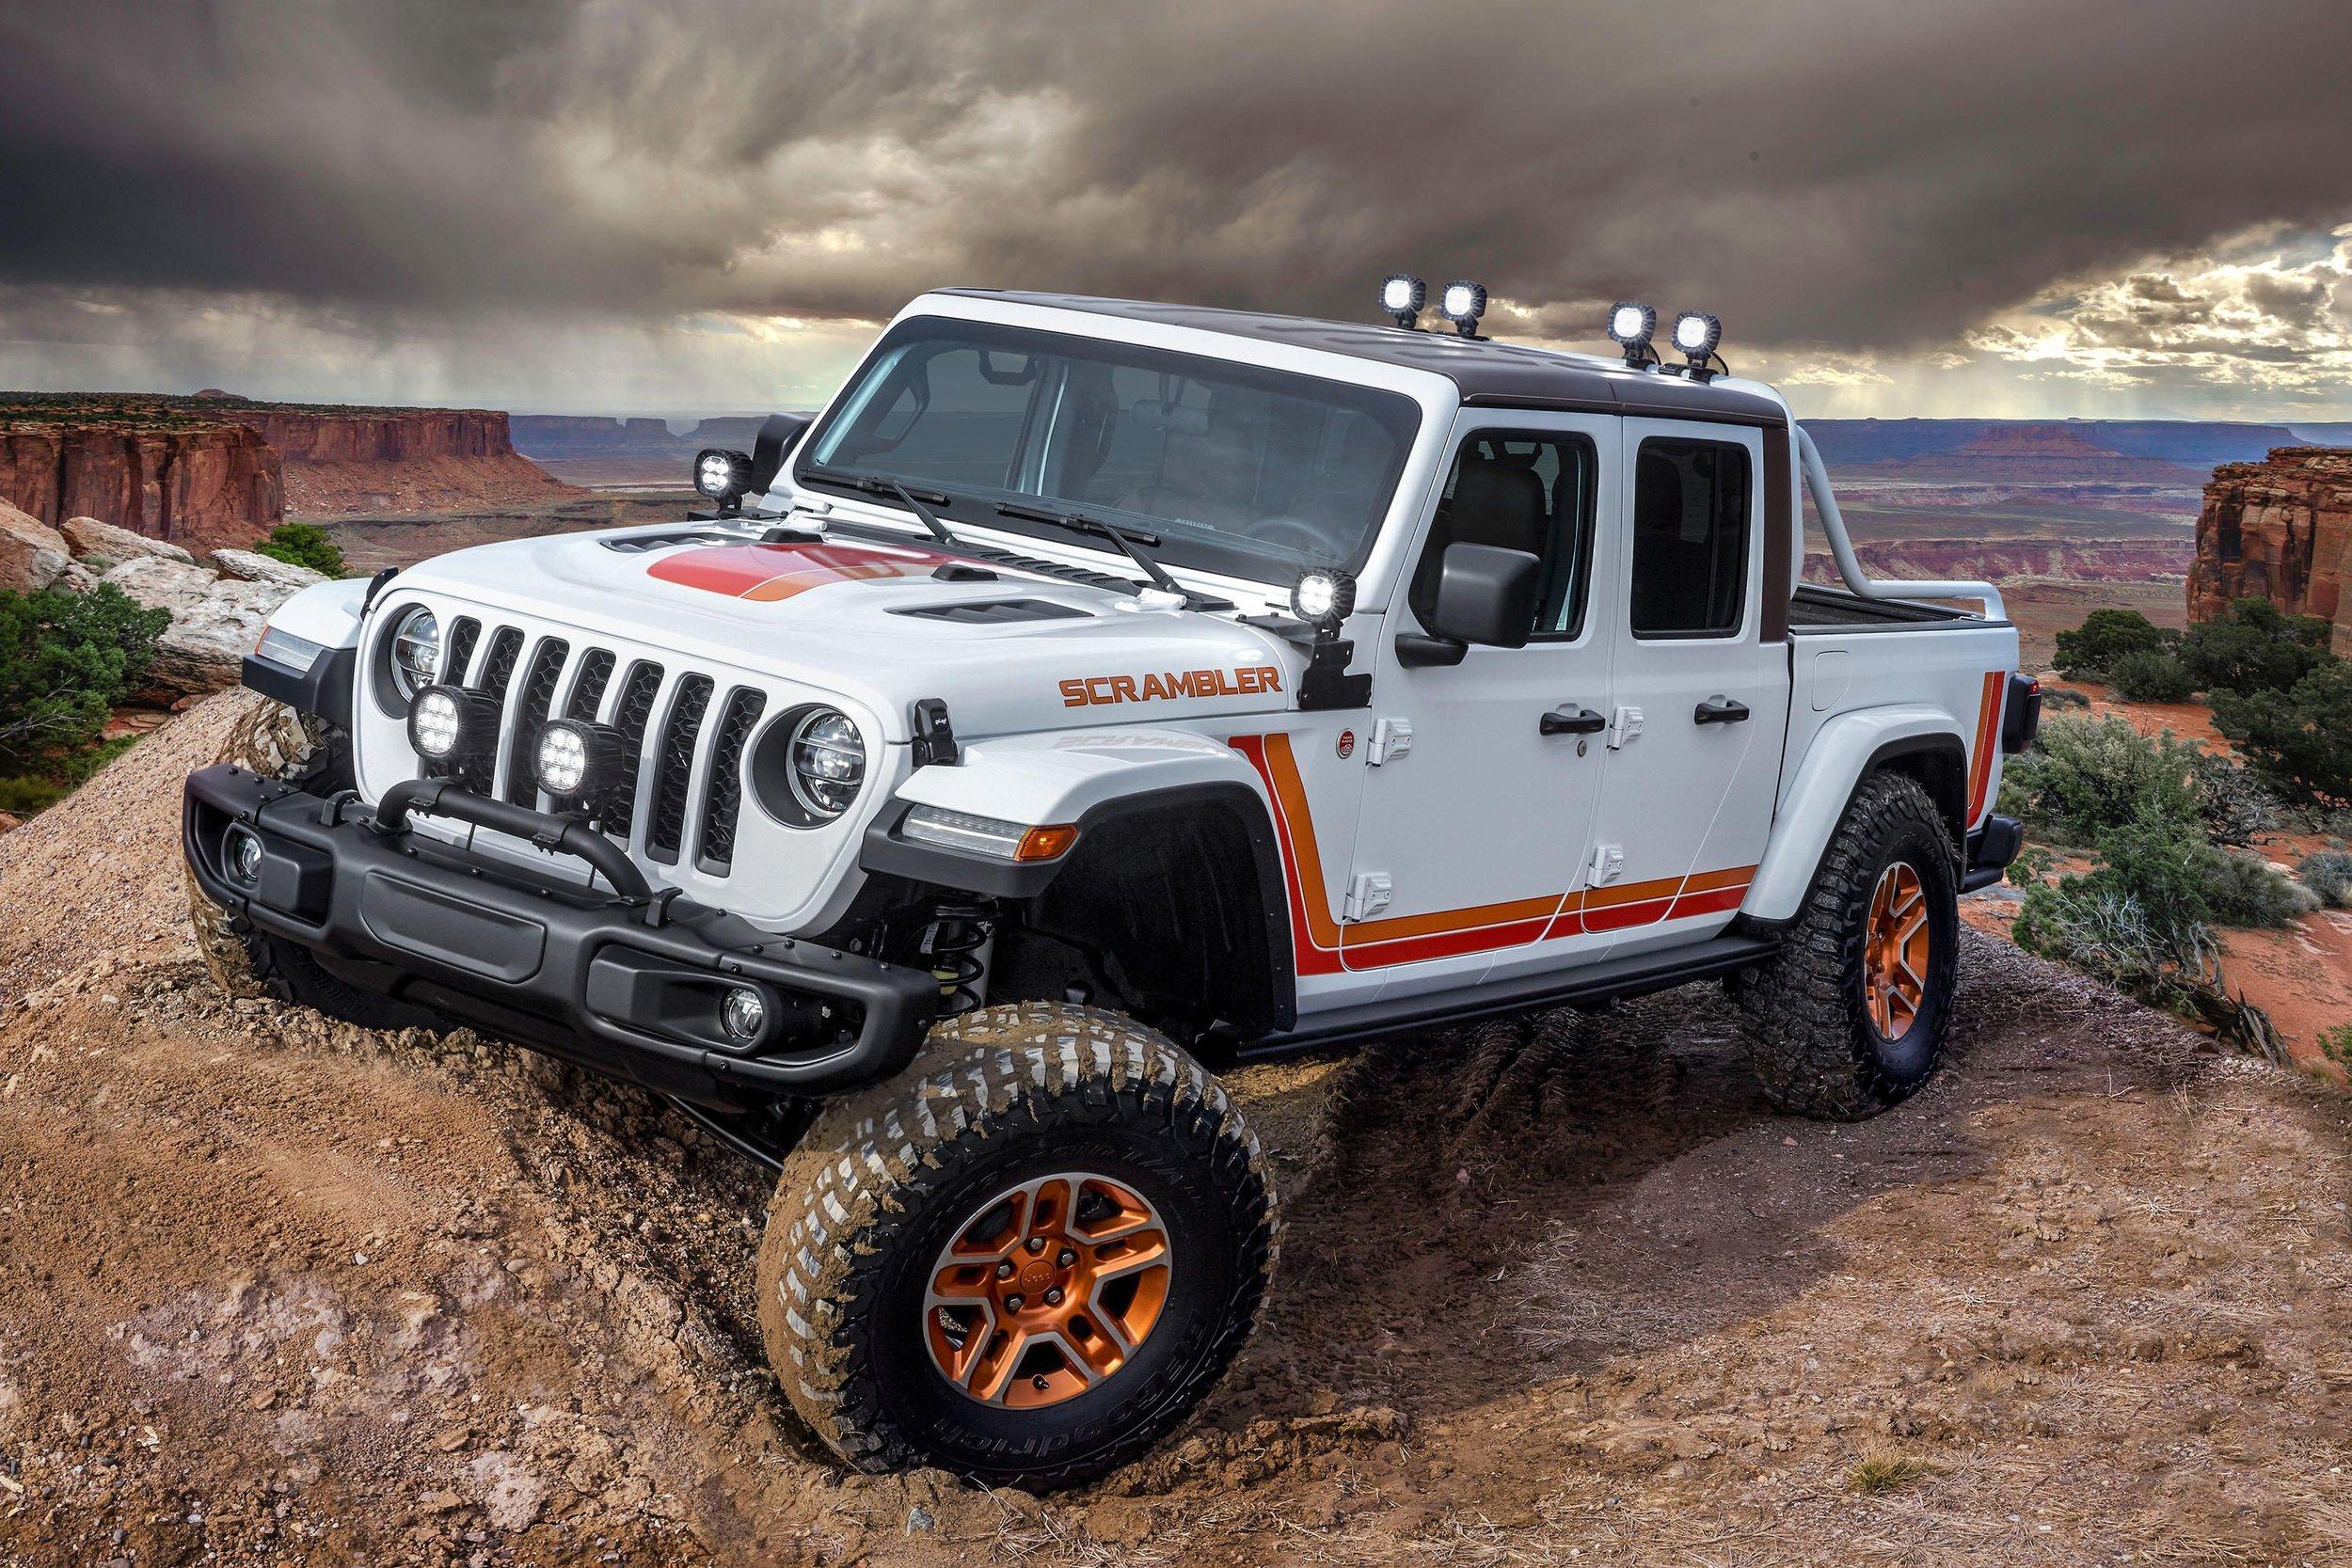 jeep-gladiator-jt-scrambler-22.jpg